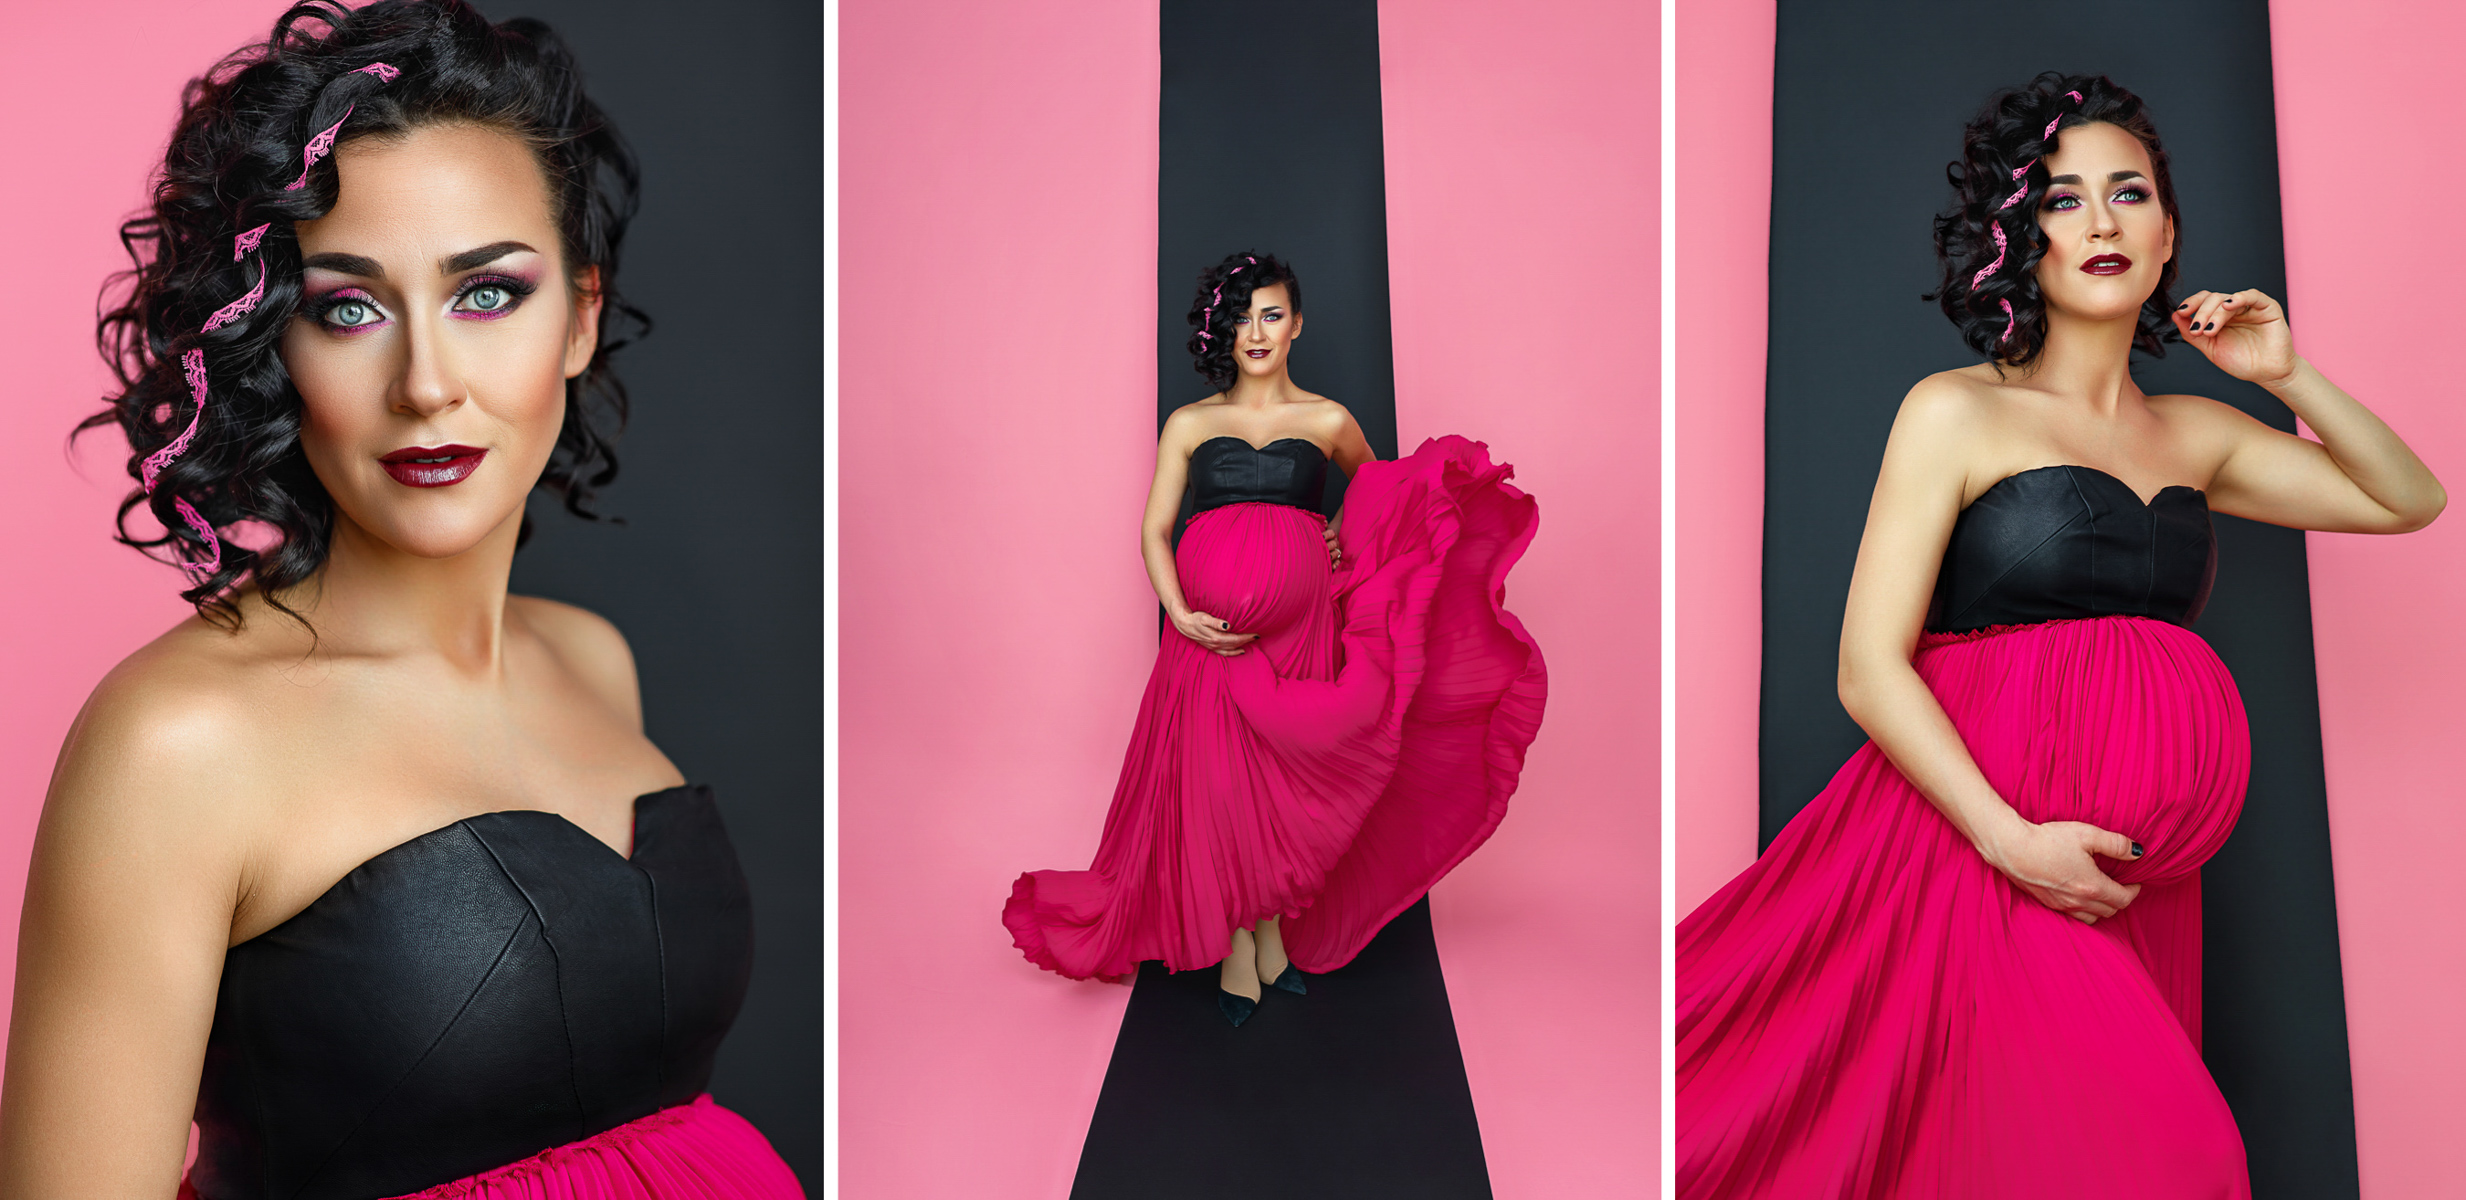 Studio maternity photographer